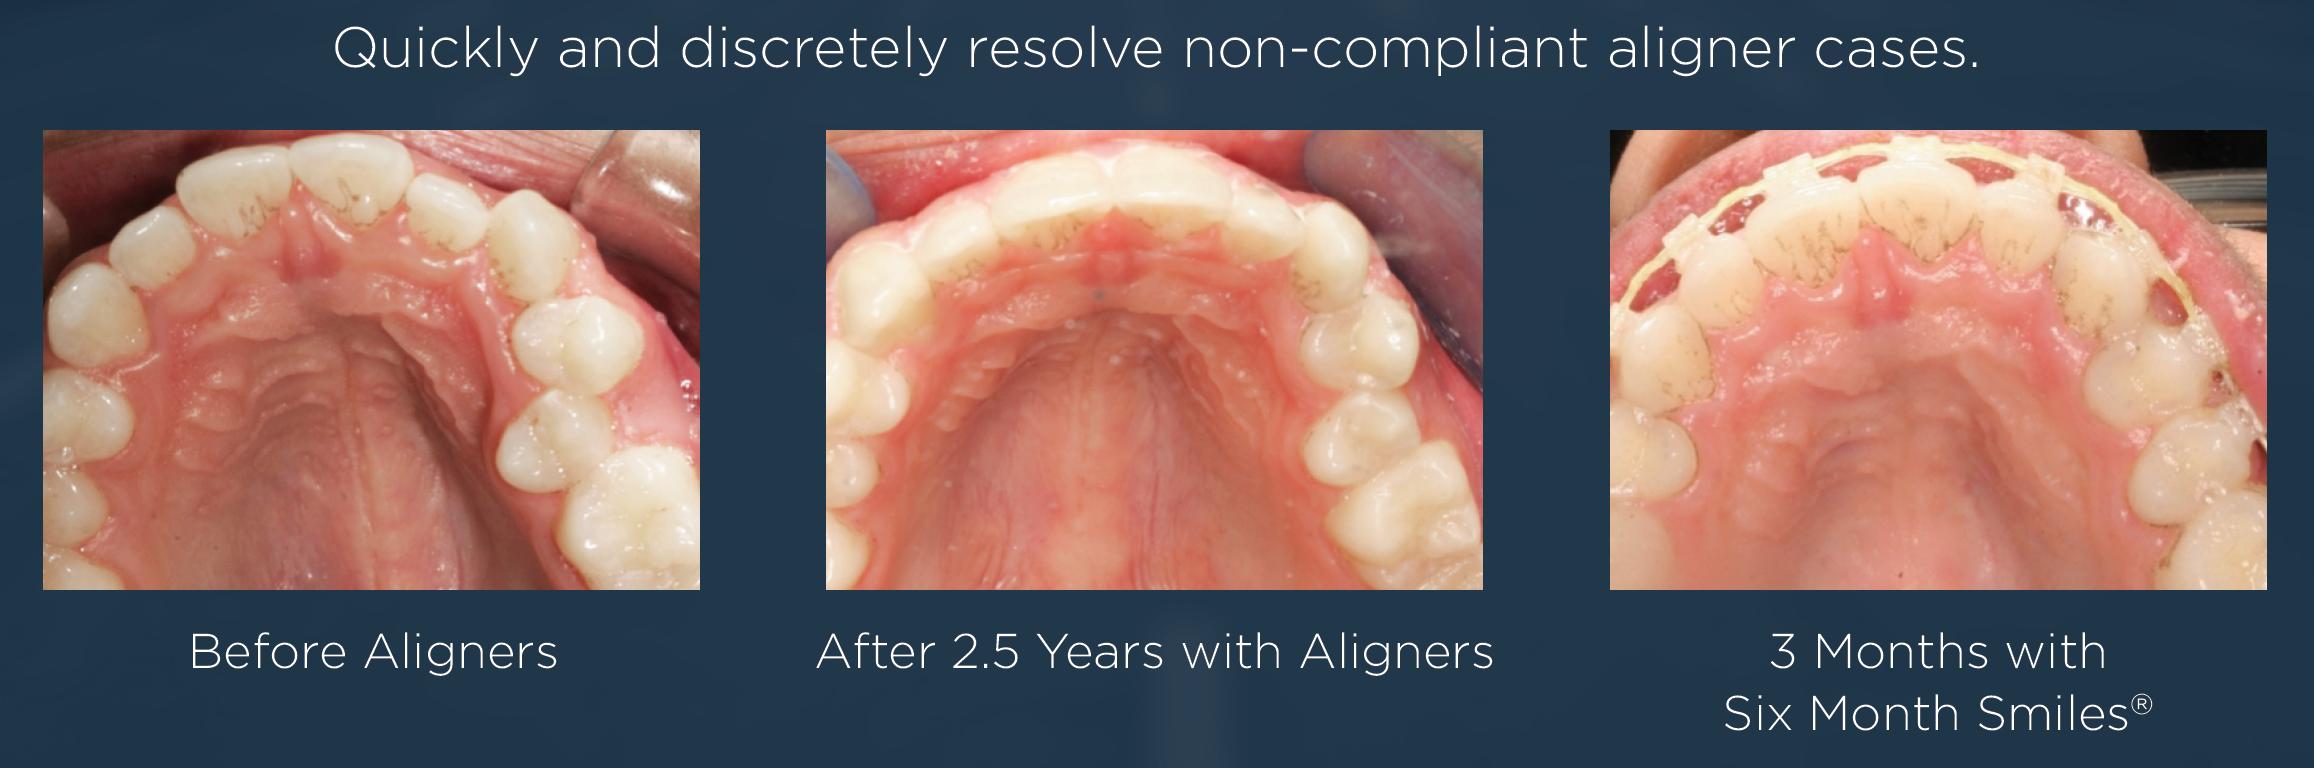 Six Month Smiles vs Invisalign or Aligners